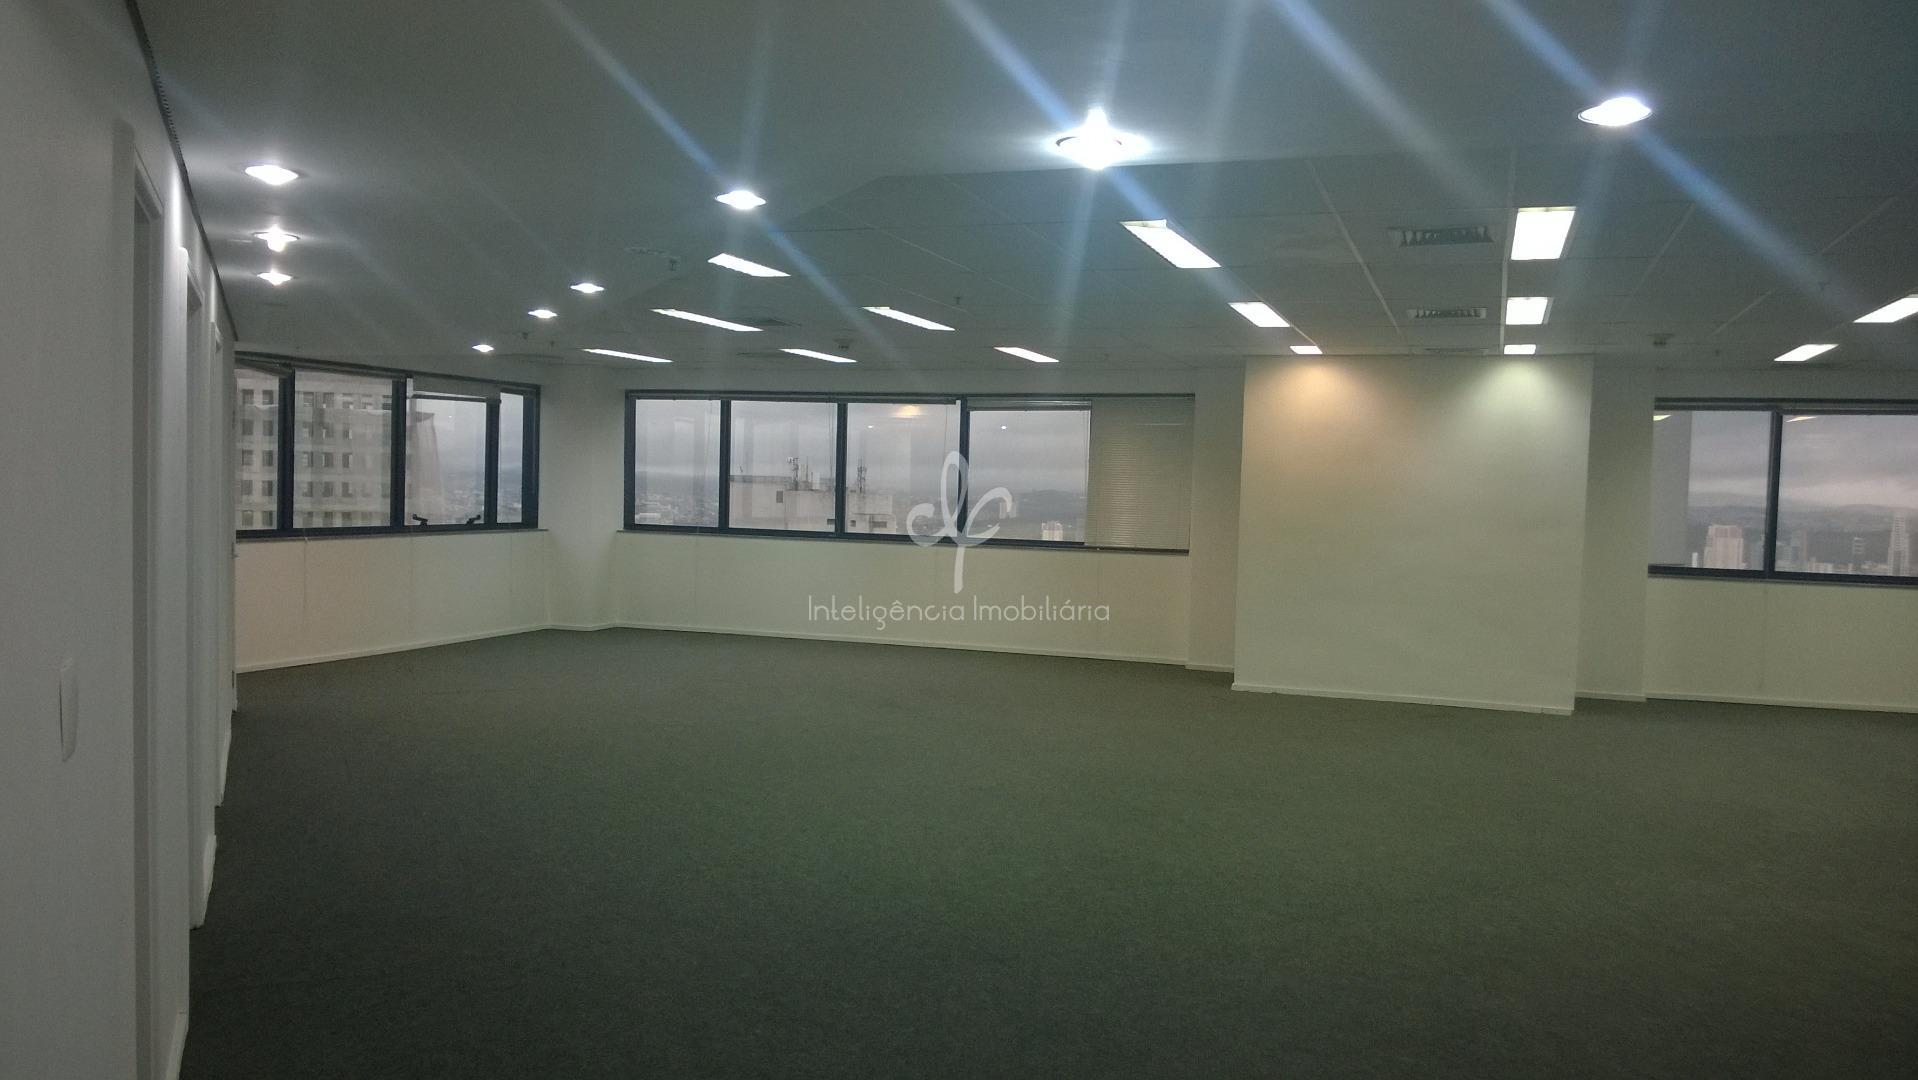 Laje corporativa com 619,90 m², 12 banheiros, 3 copas, 15 vagas, AC, elevador privativo, Alphaville Industrial, Barueri.